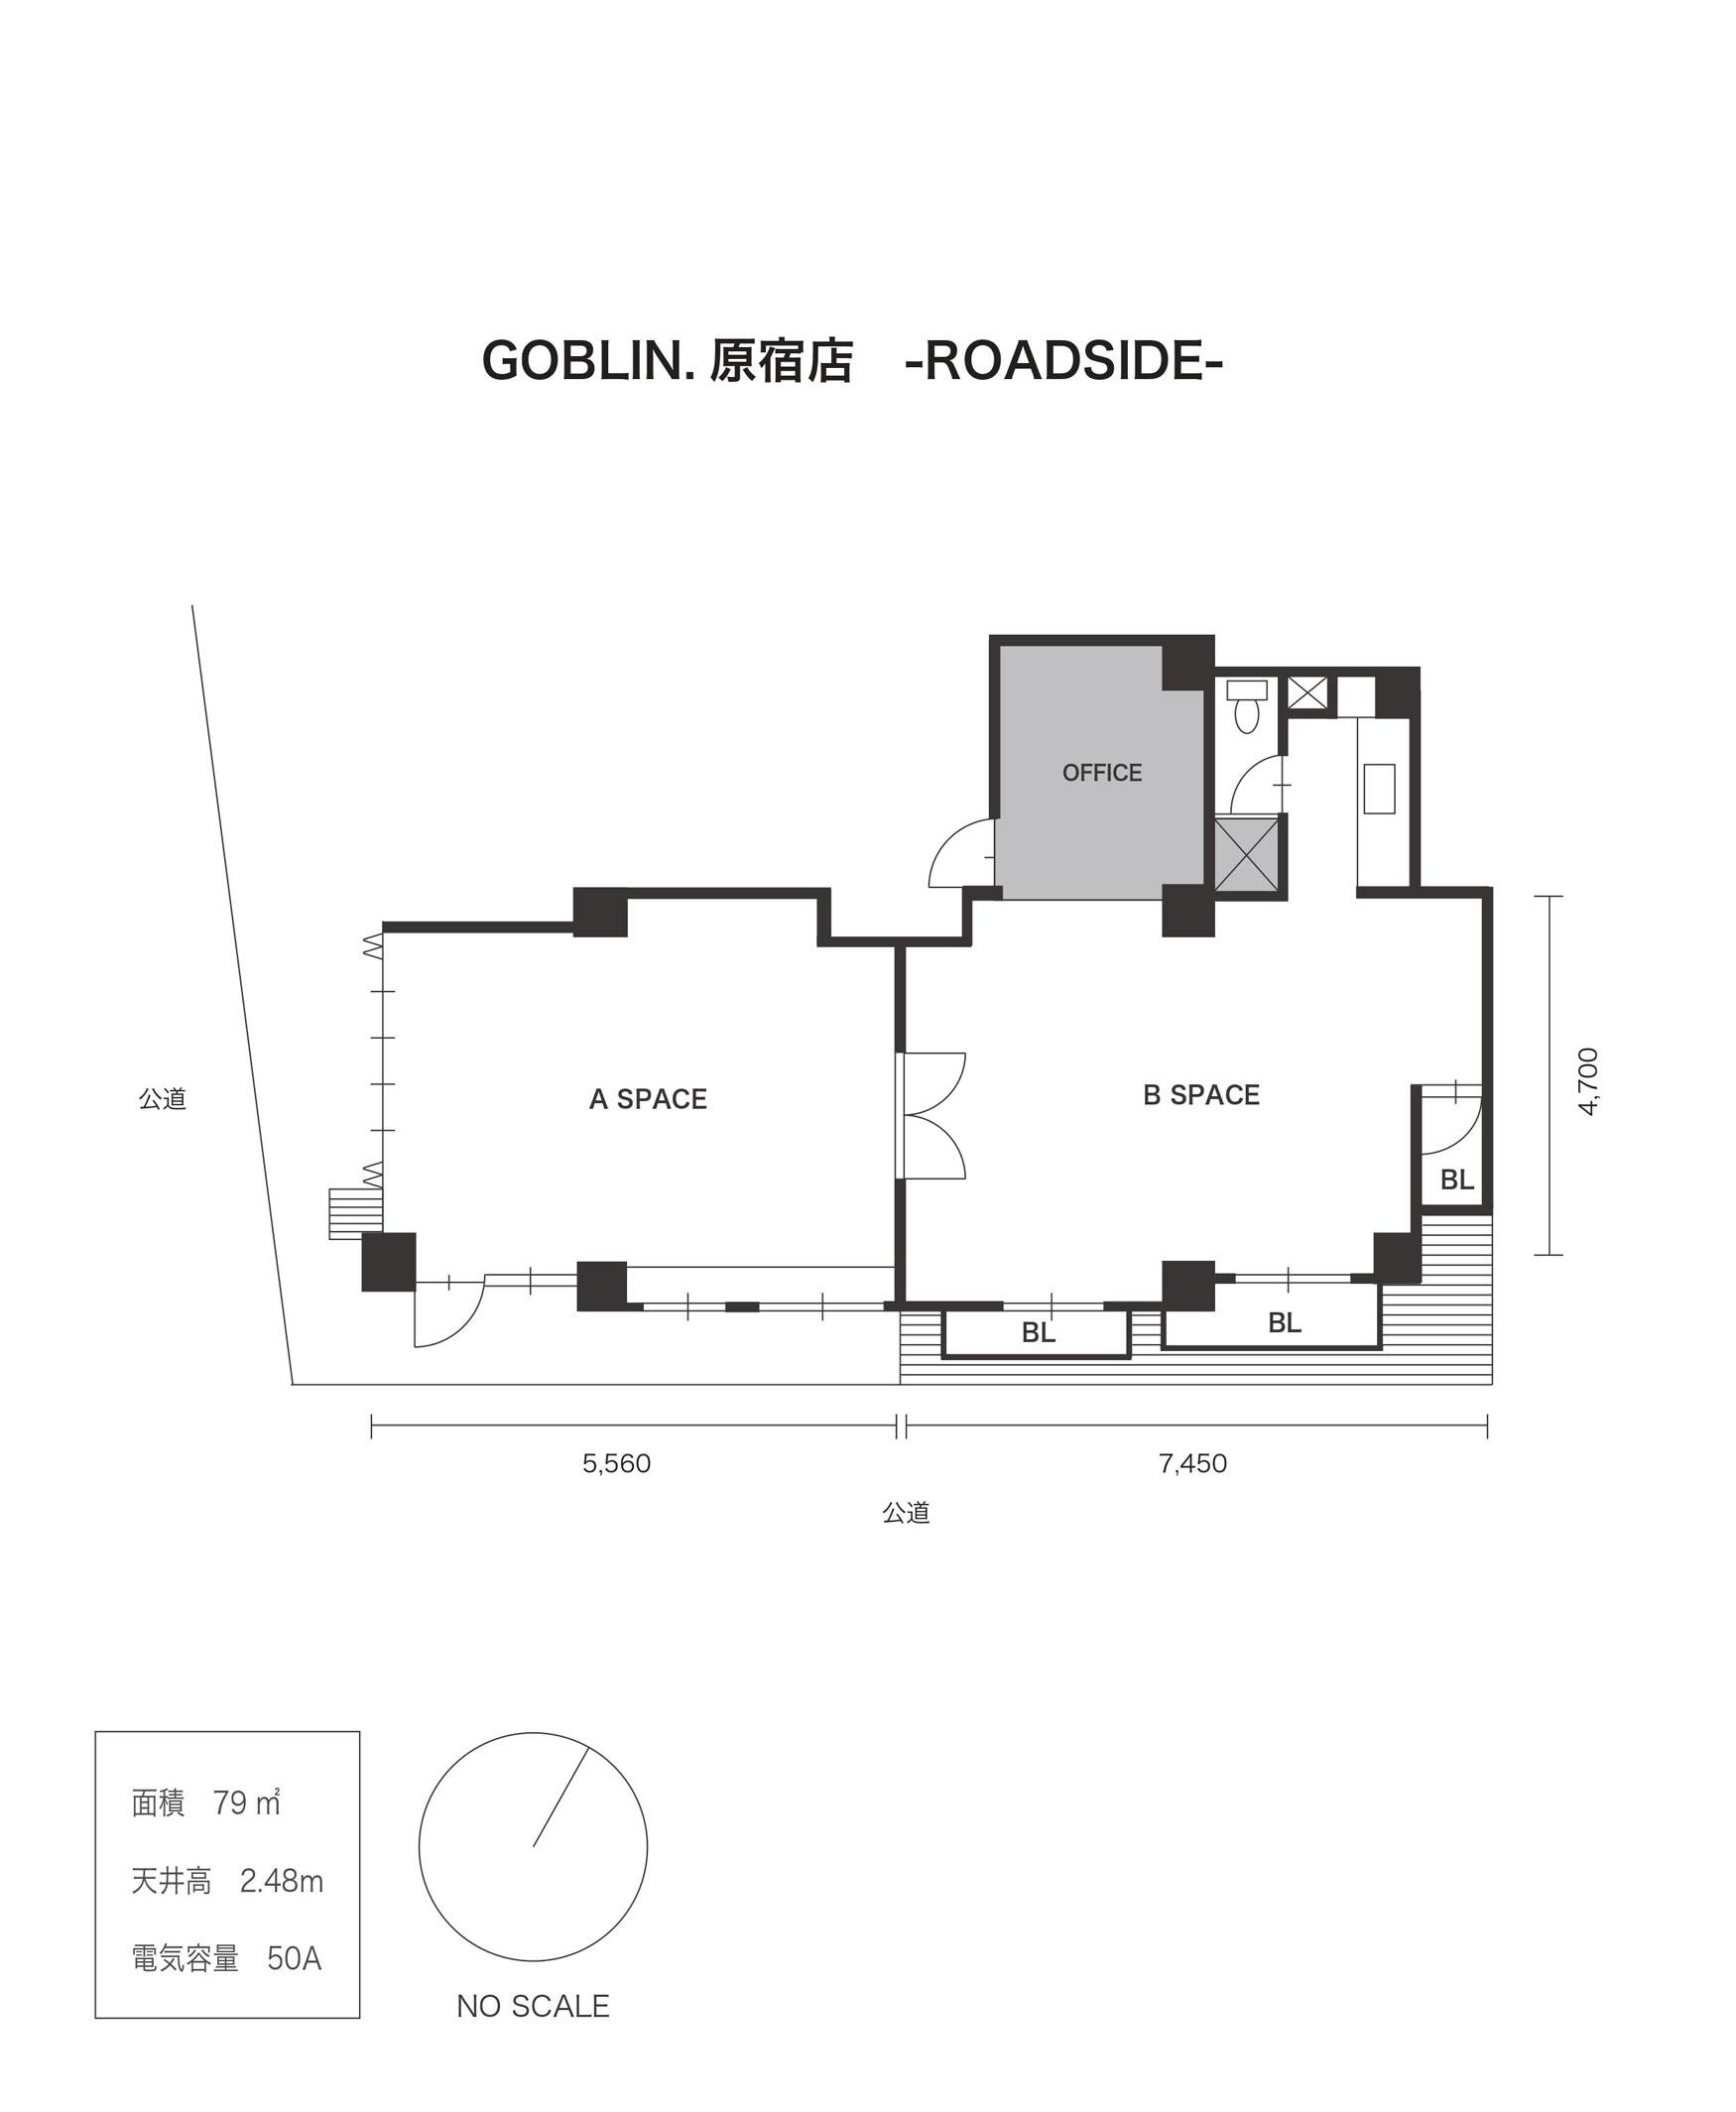 GOBLIN.原宿-ROADSIDE- (ID:10060) 図面